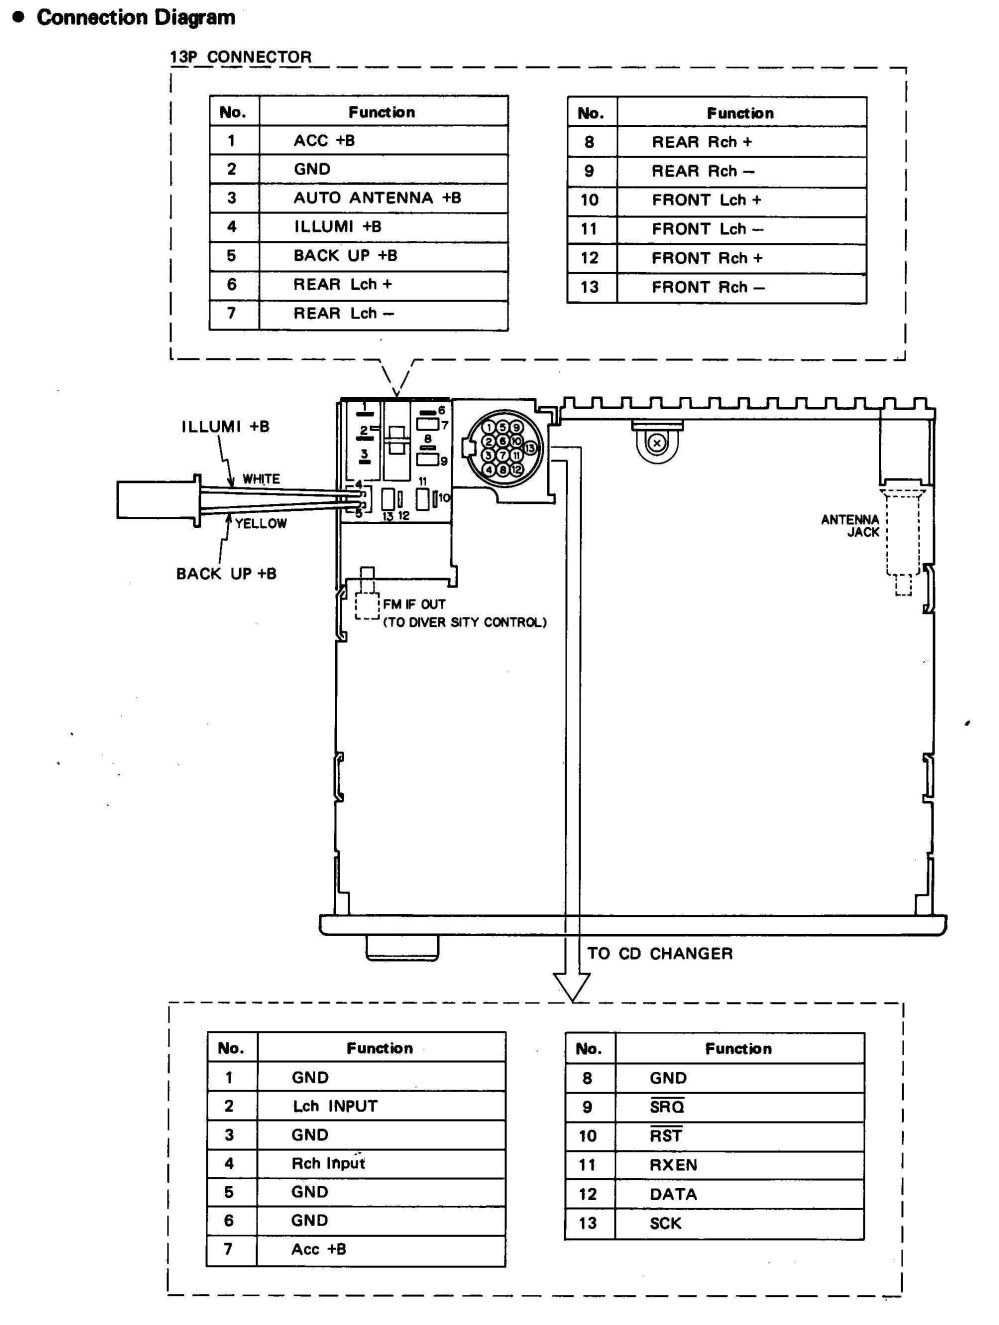 medium resolution of home speaker wiring diagram wiring diagram definition new home speaker wiring diagram 16d